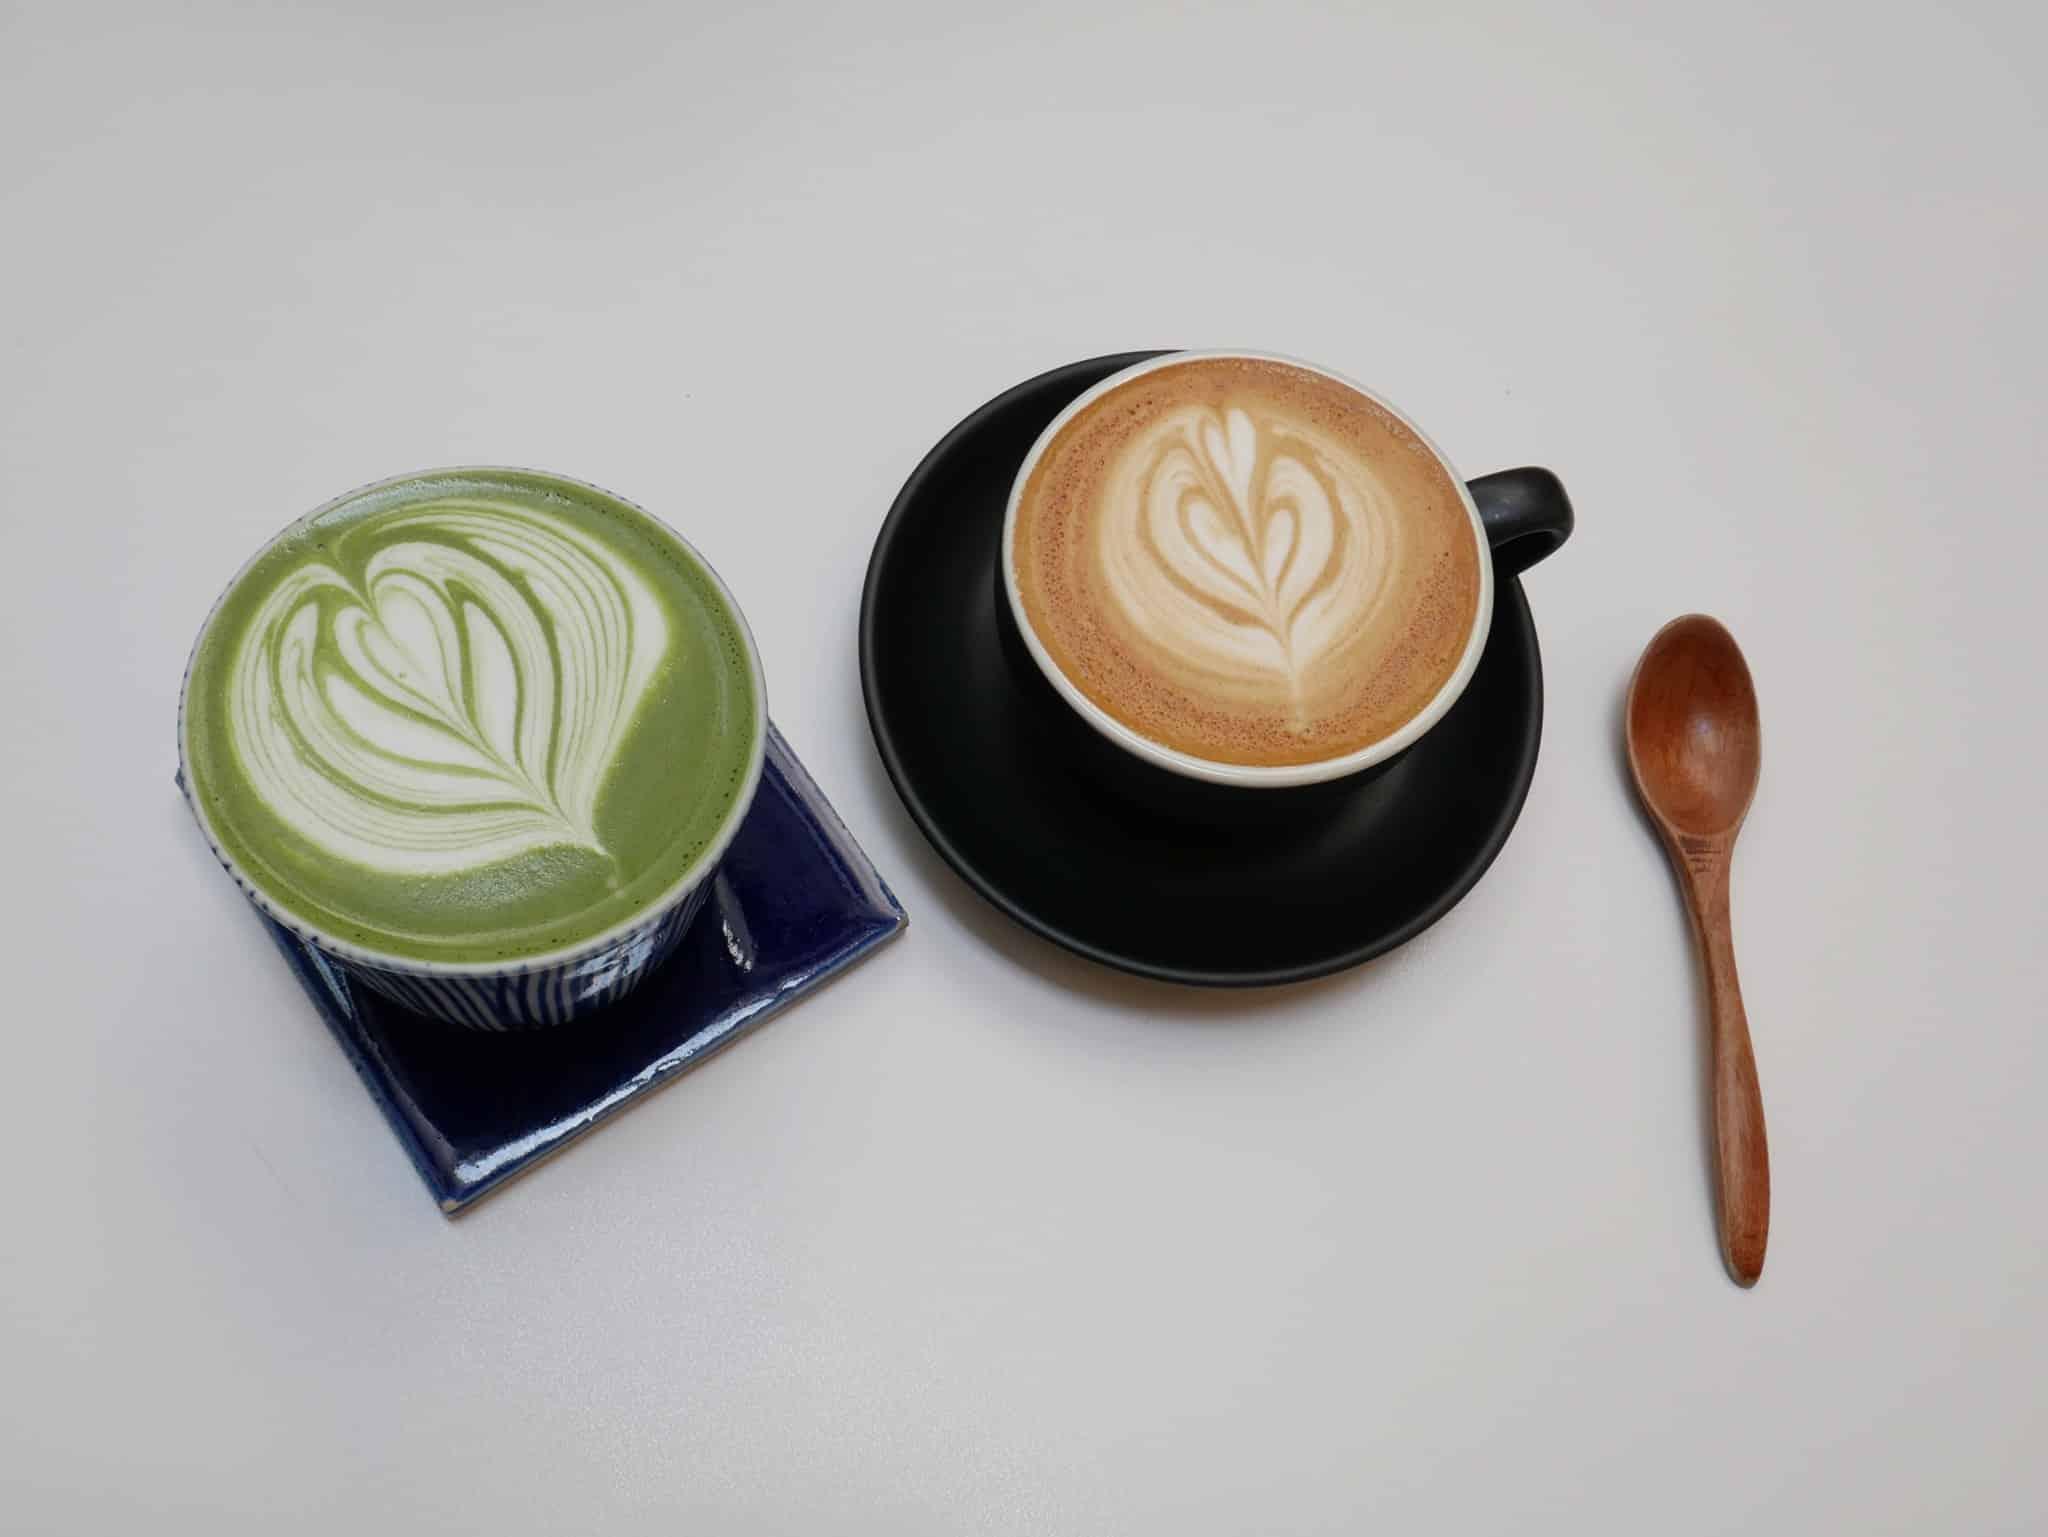 Keto Coffee (Bulletproof Coffee) - The Ultimate Weight Loss Hack